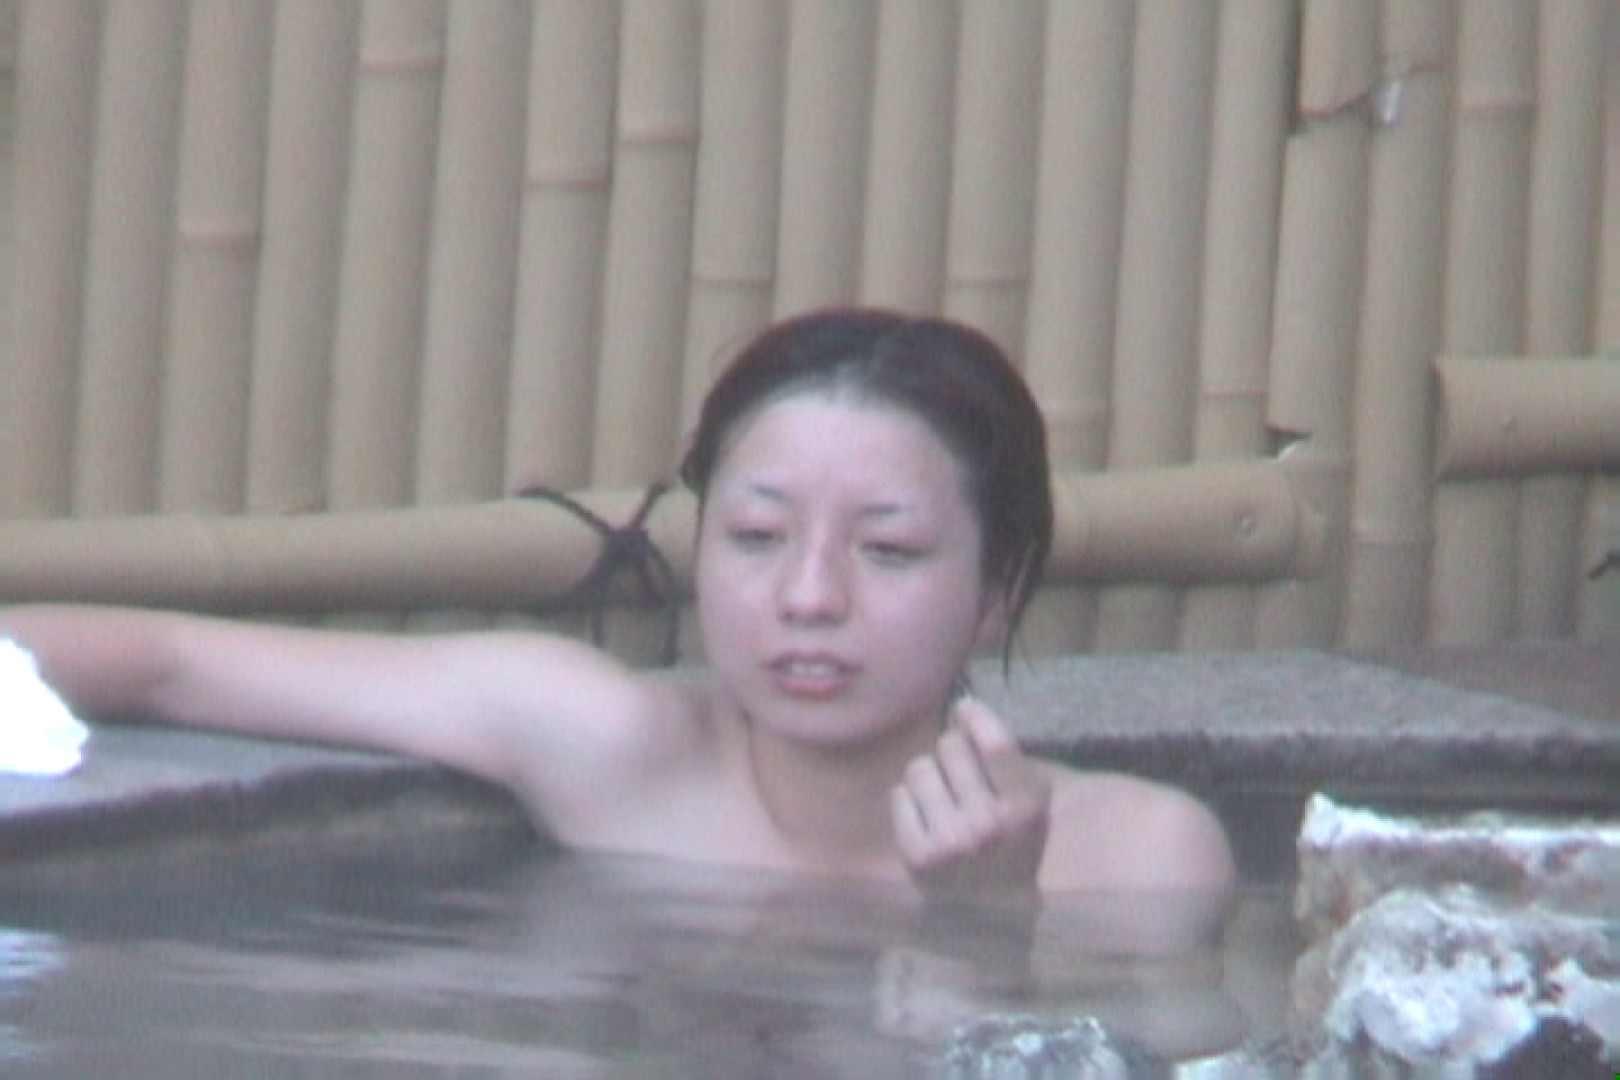 Aquaな露天風呂Vol.608 盗撮 戯れ無修正画像 69連発 65